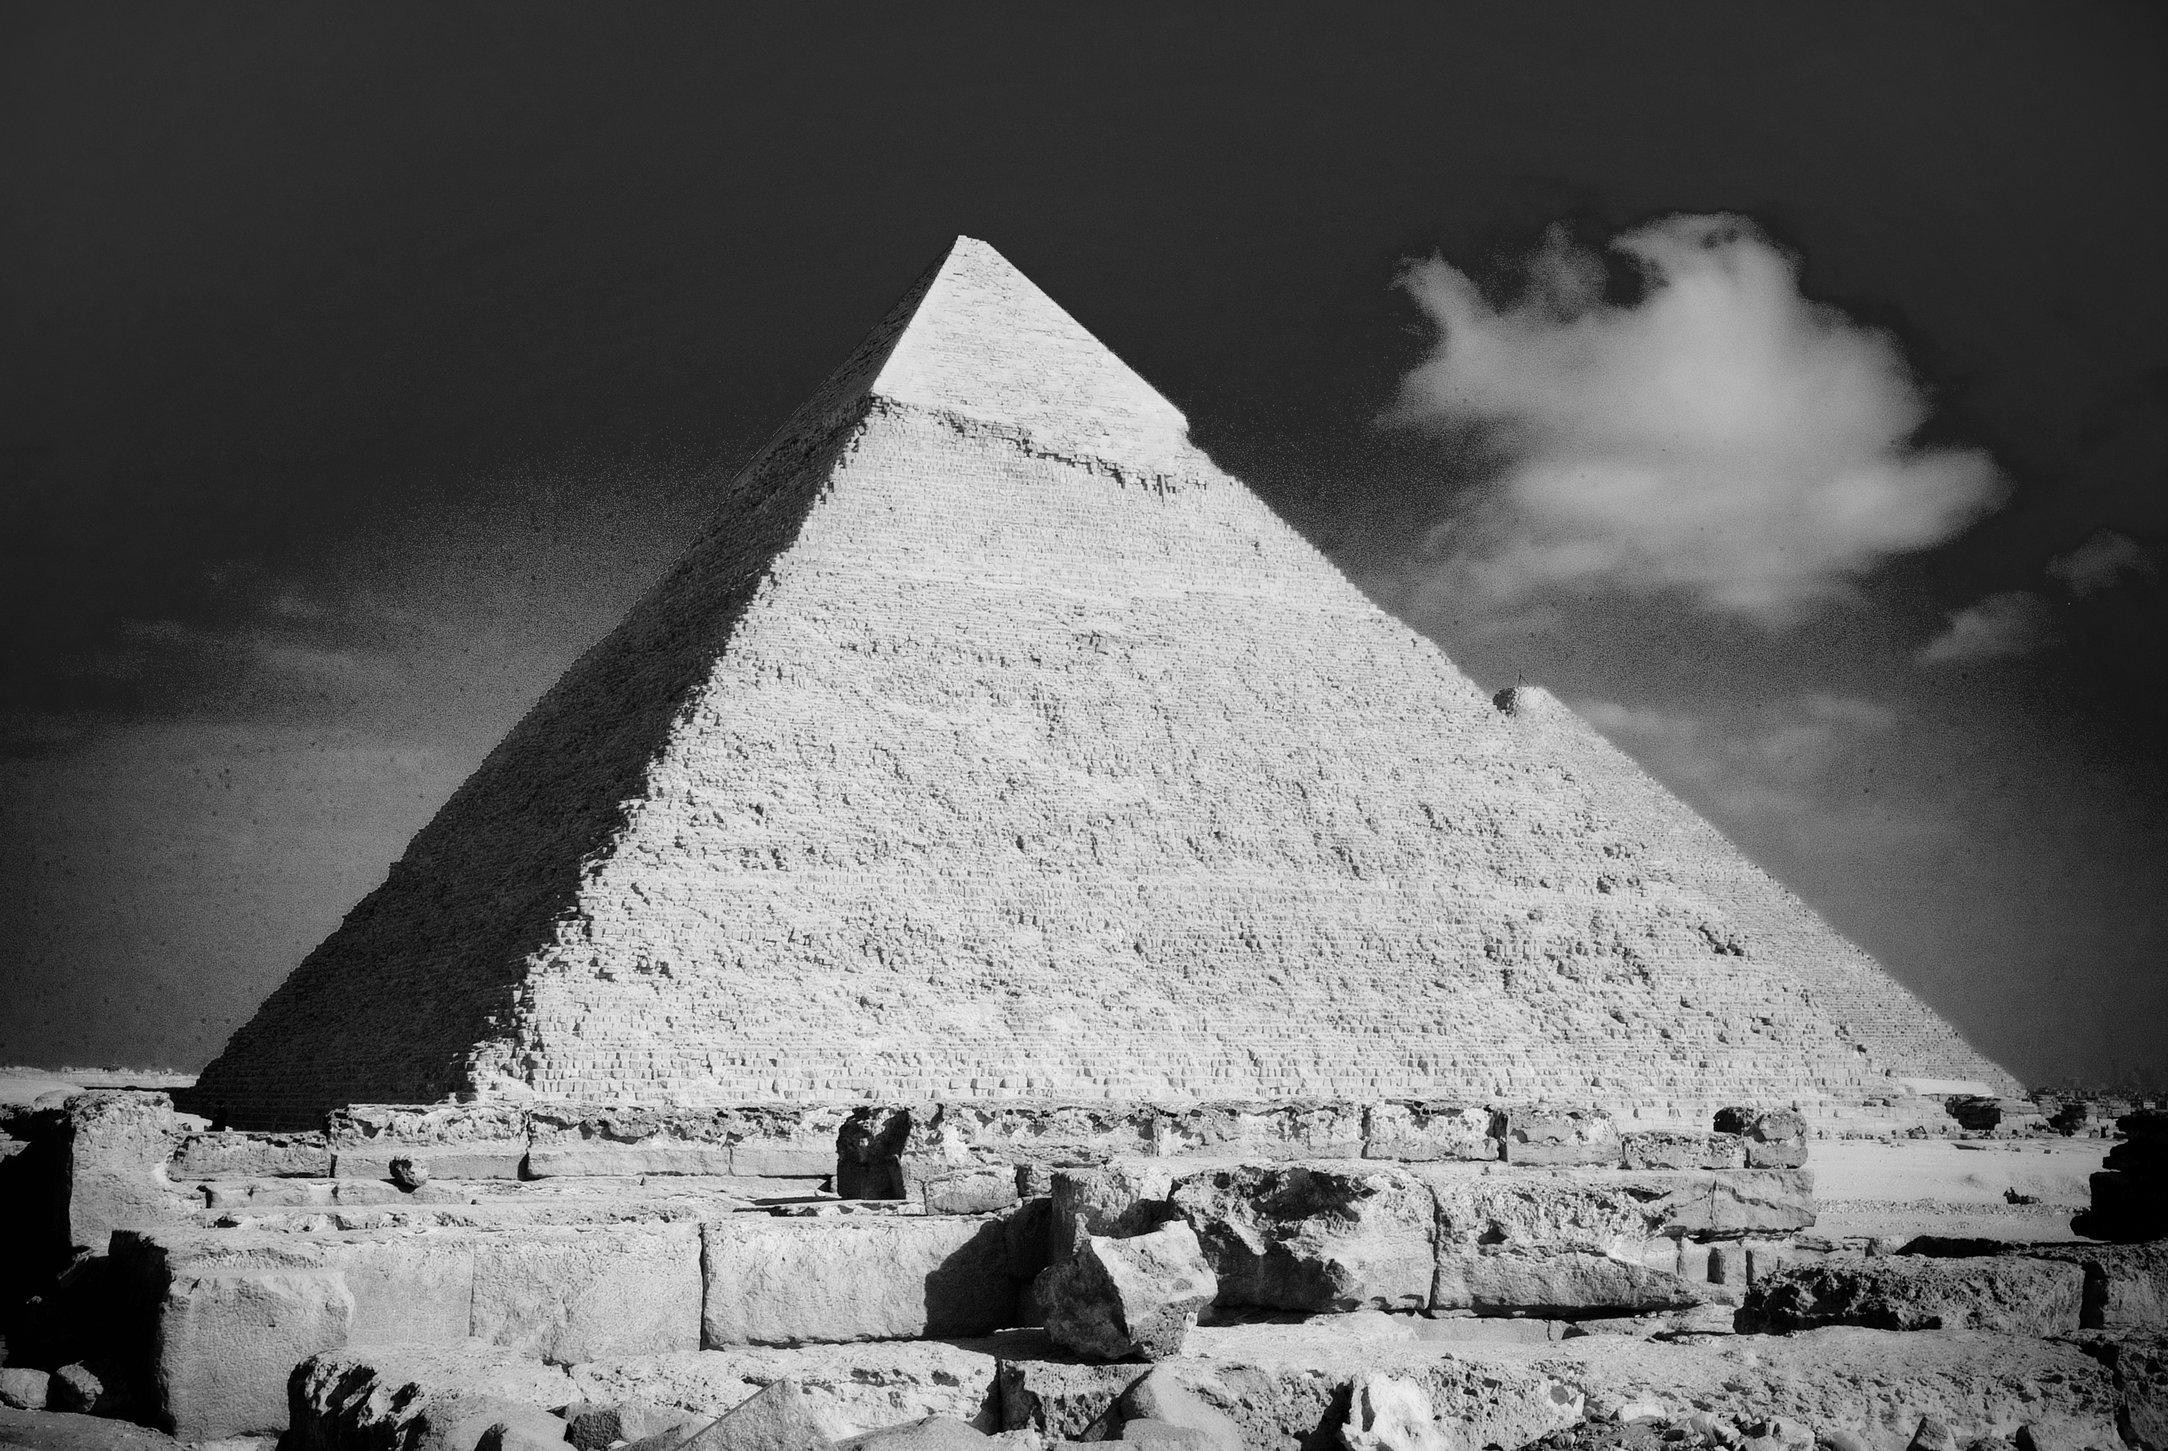 B&W Pyramid III